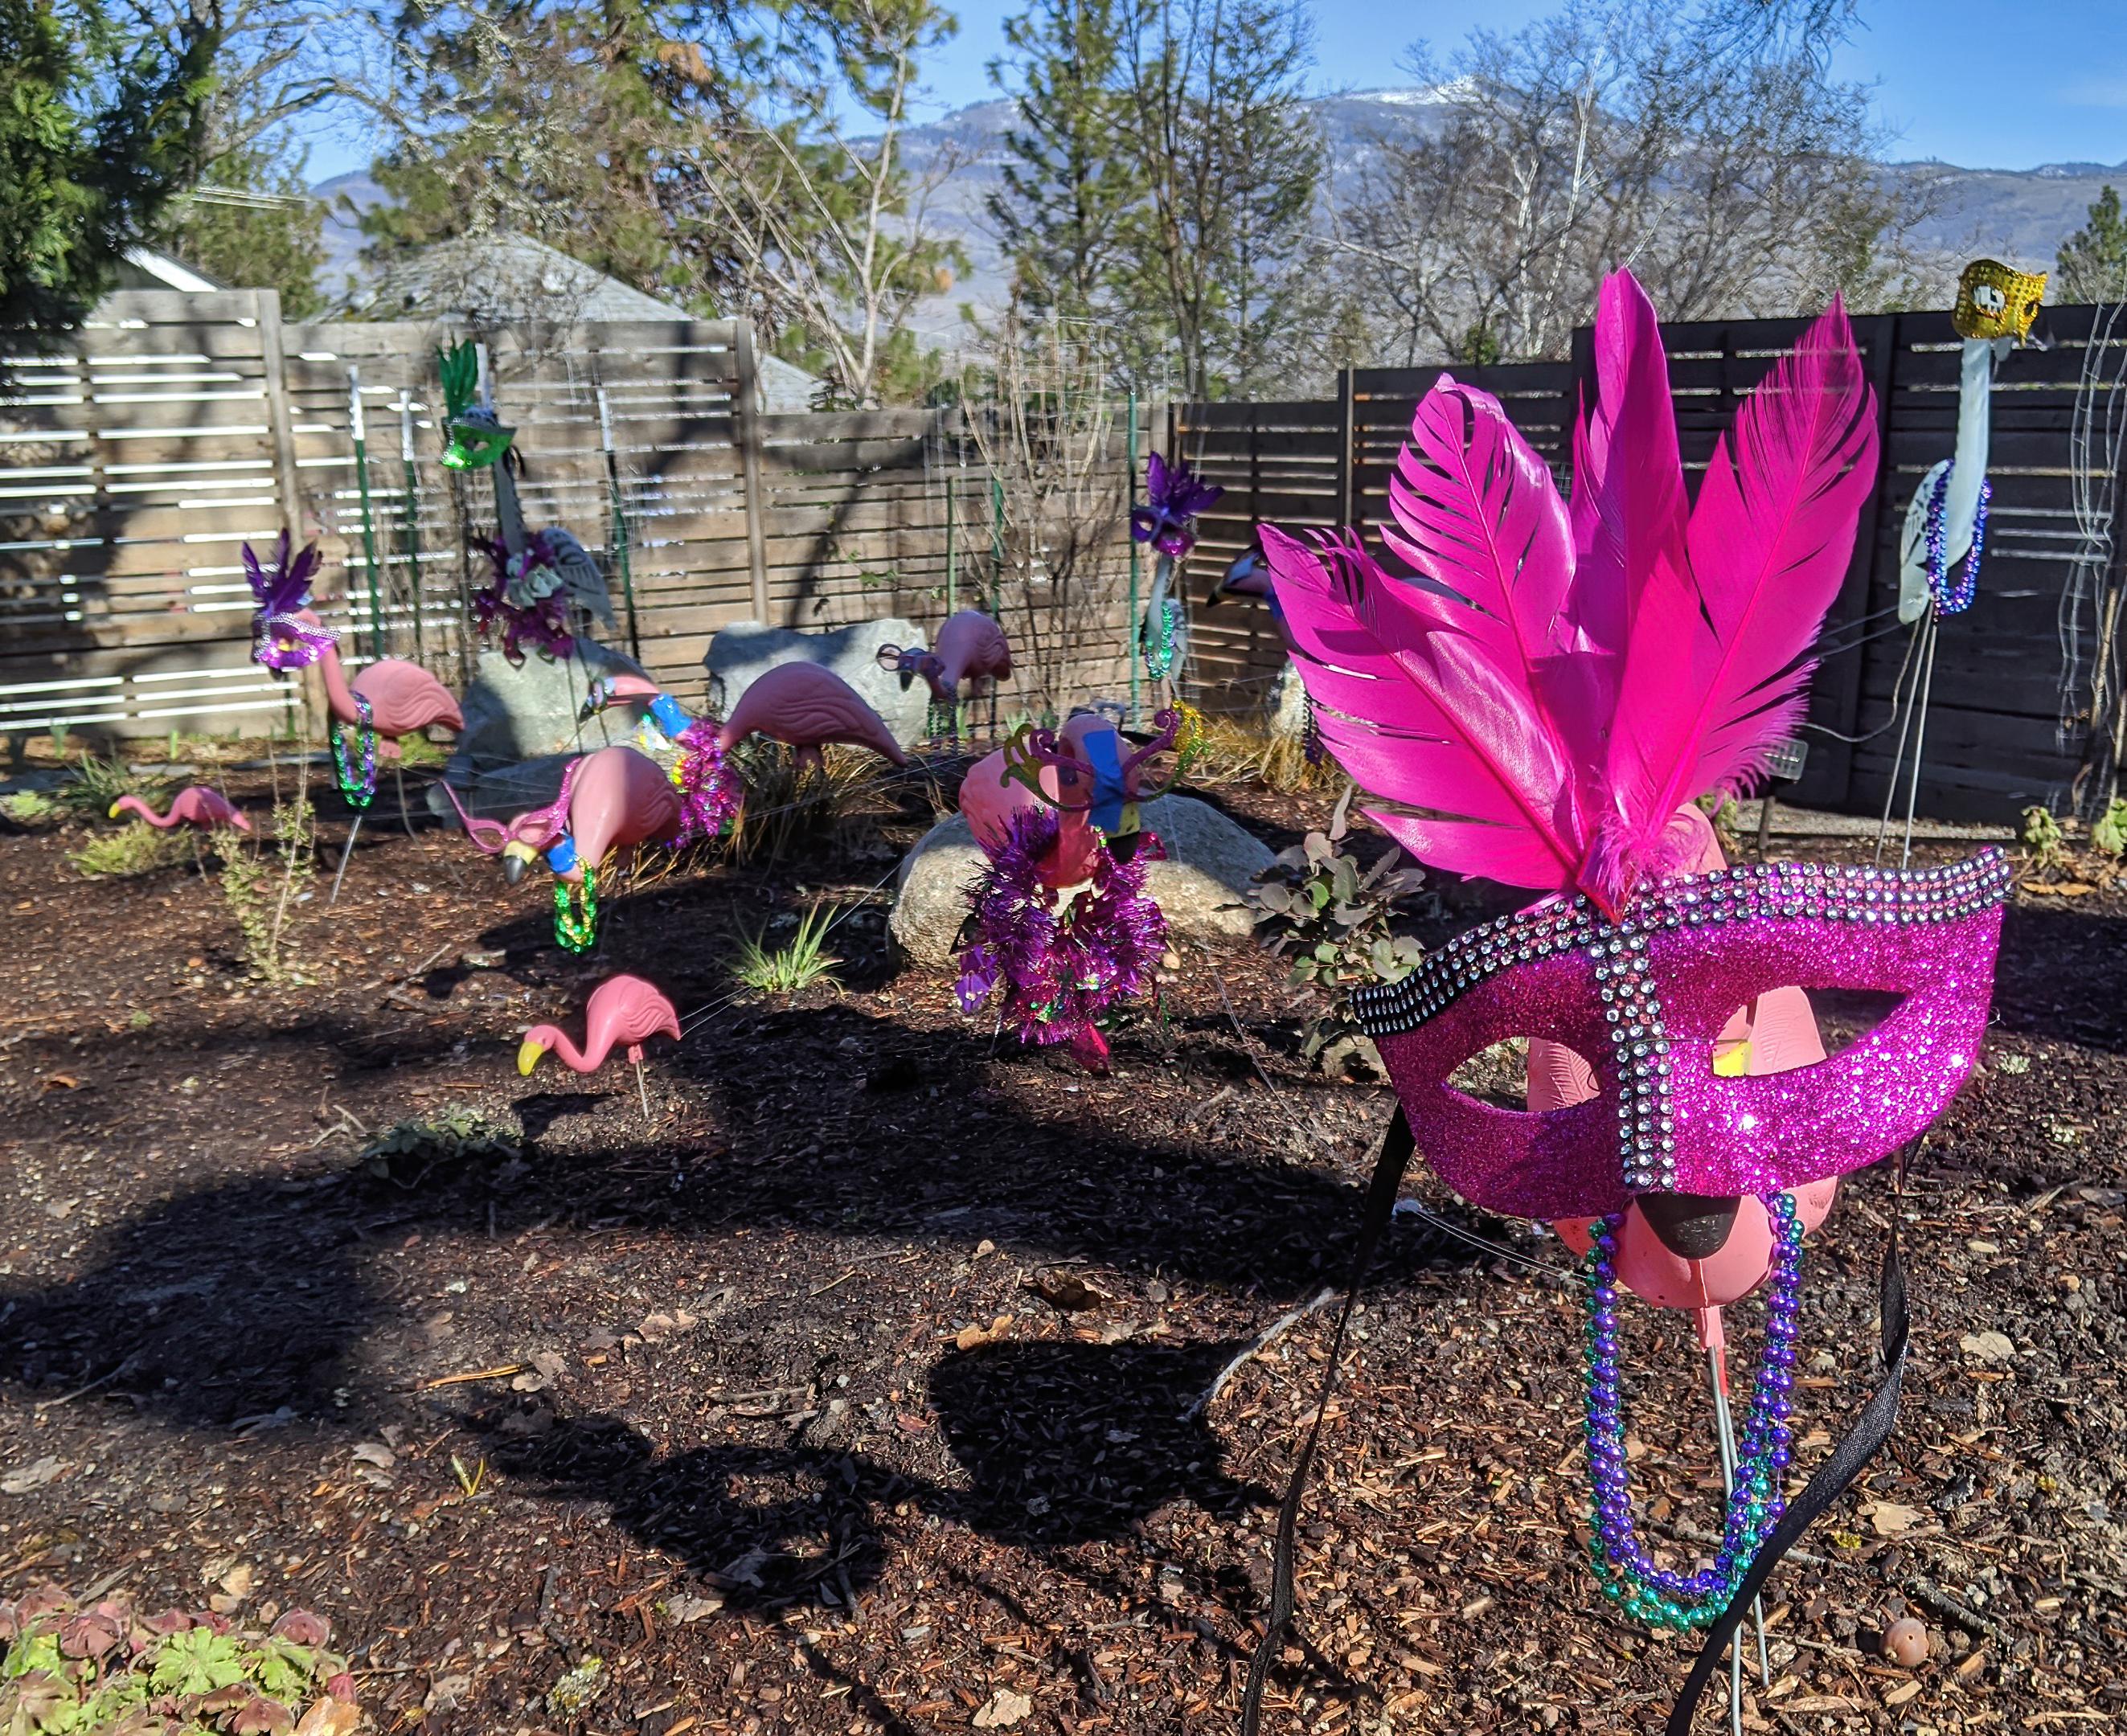 mardi gras pink flamingo lawn ornaments - topaz ai denoise